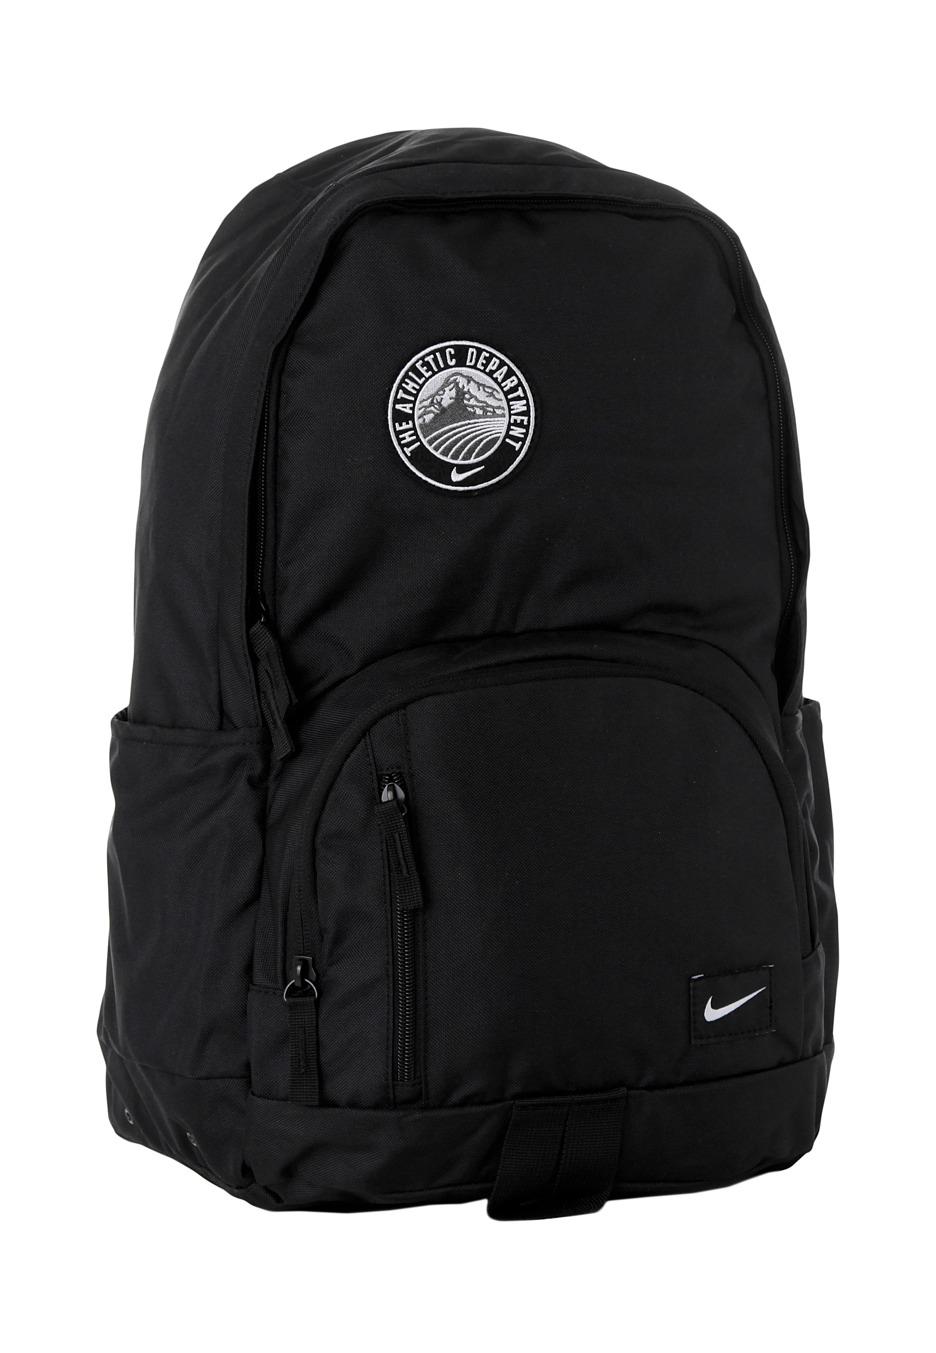 52e07181e7a3 Nike - All Access Soleday Black Black White - Backpack - Streetwear Shop -  Impericon.com UK